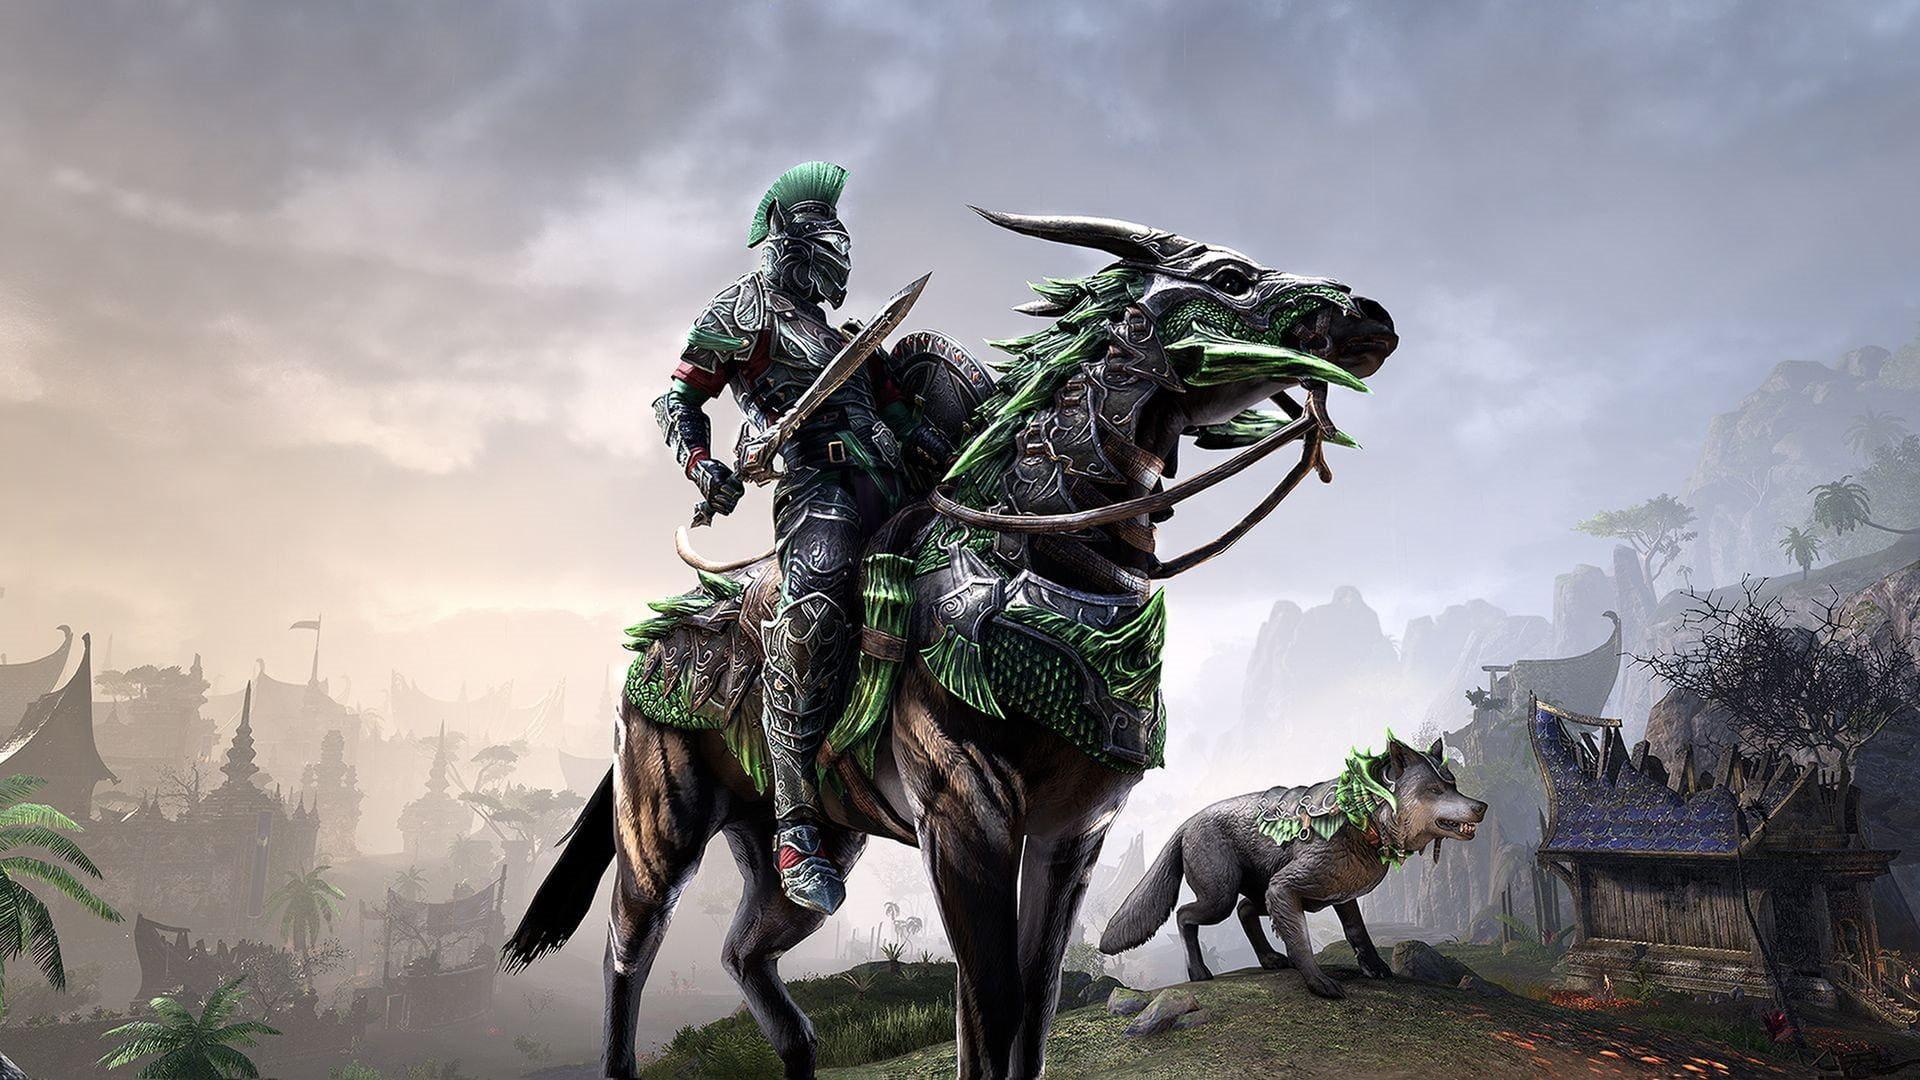 The Elder Scrolls Online obohatilo DLC a update ezgif.com webp to jpg